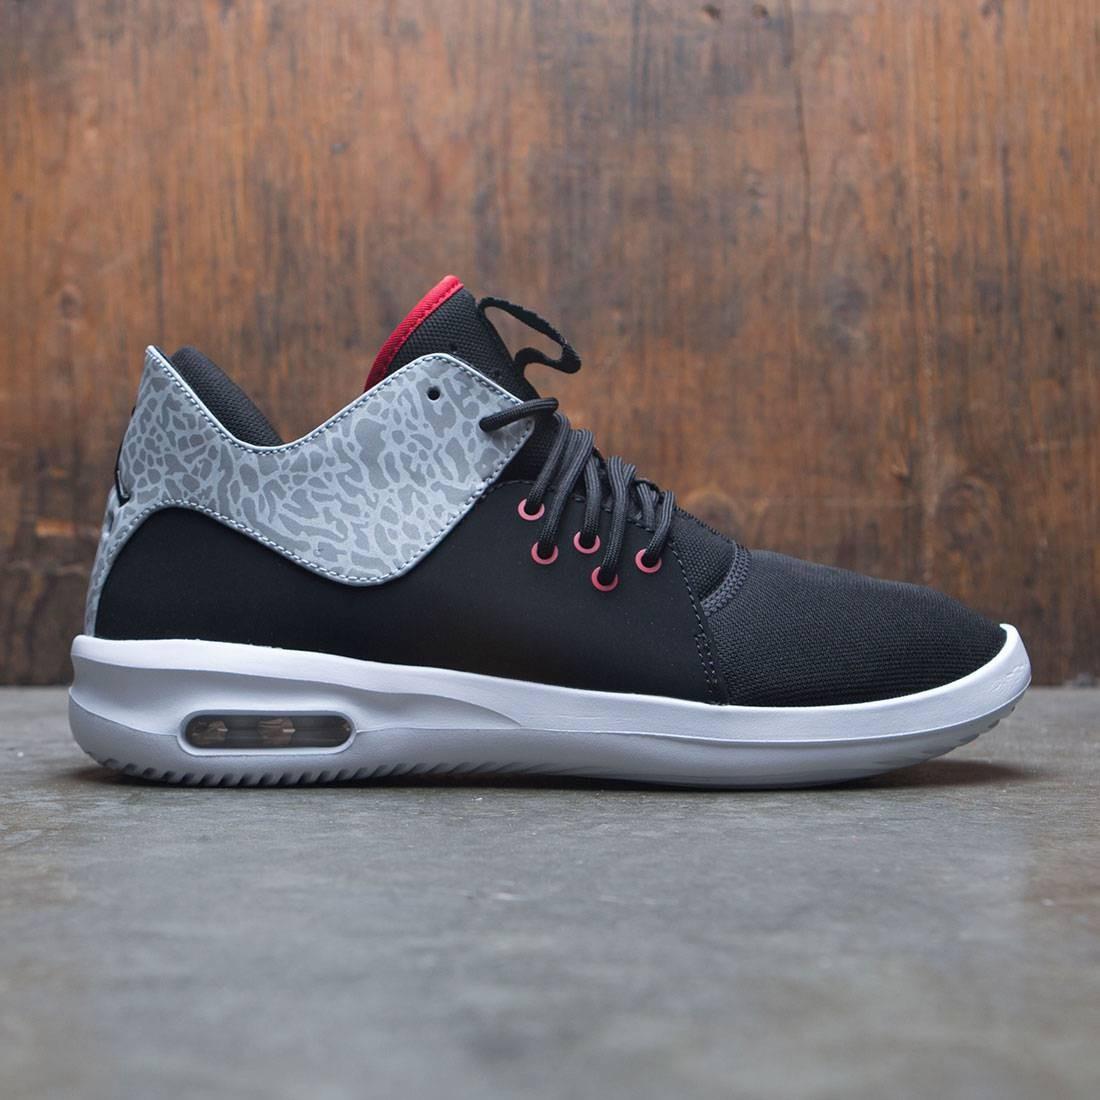 Air Jordan Silver Shoe For Sale